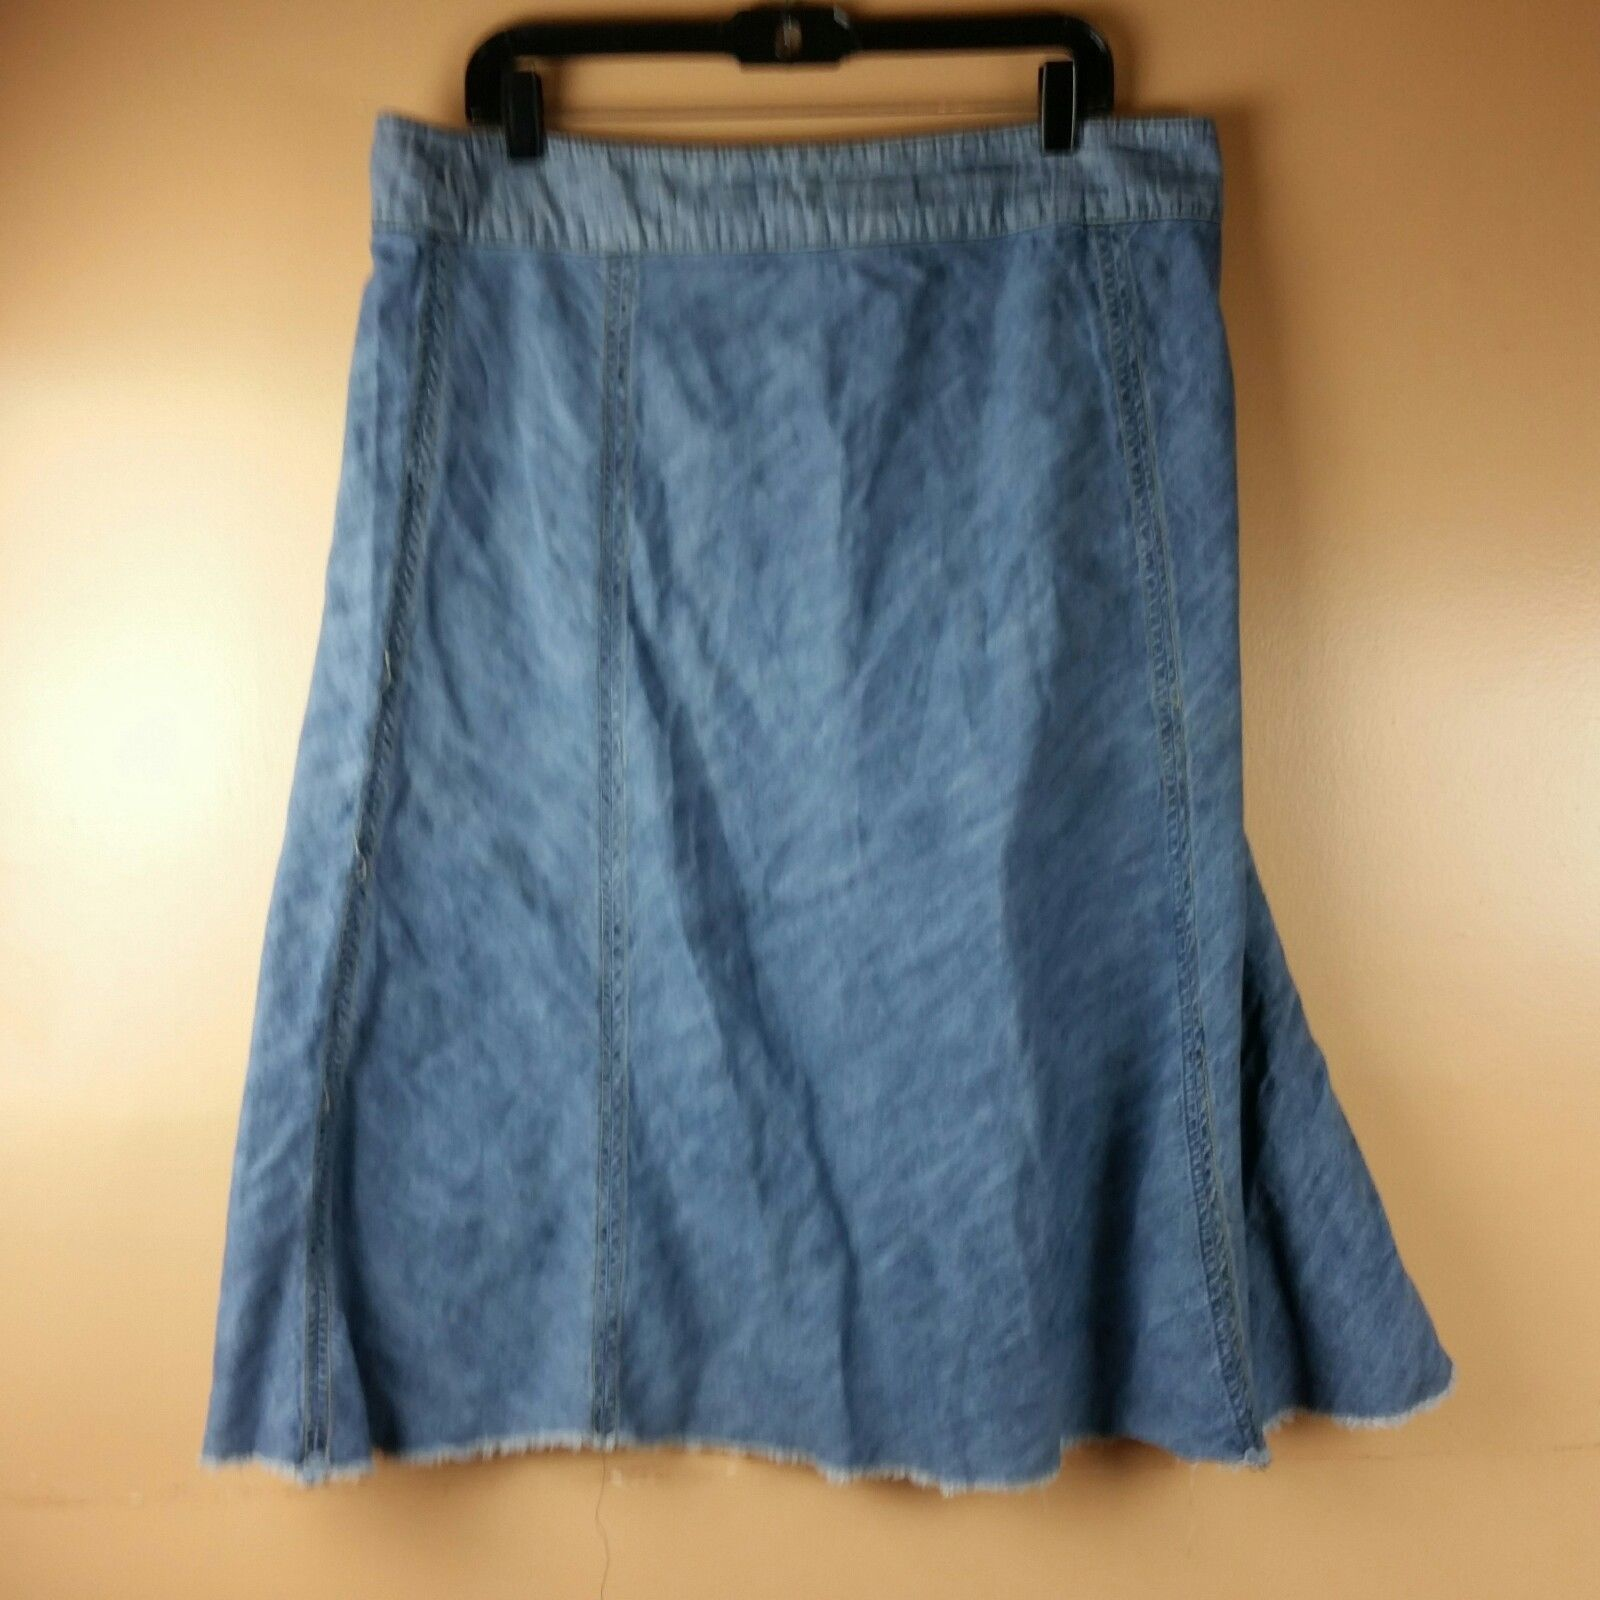 LEE Jean Skirt Womens One True Fit Modest Denim Fringe Hem Size 15/16M image 4